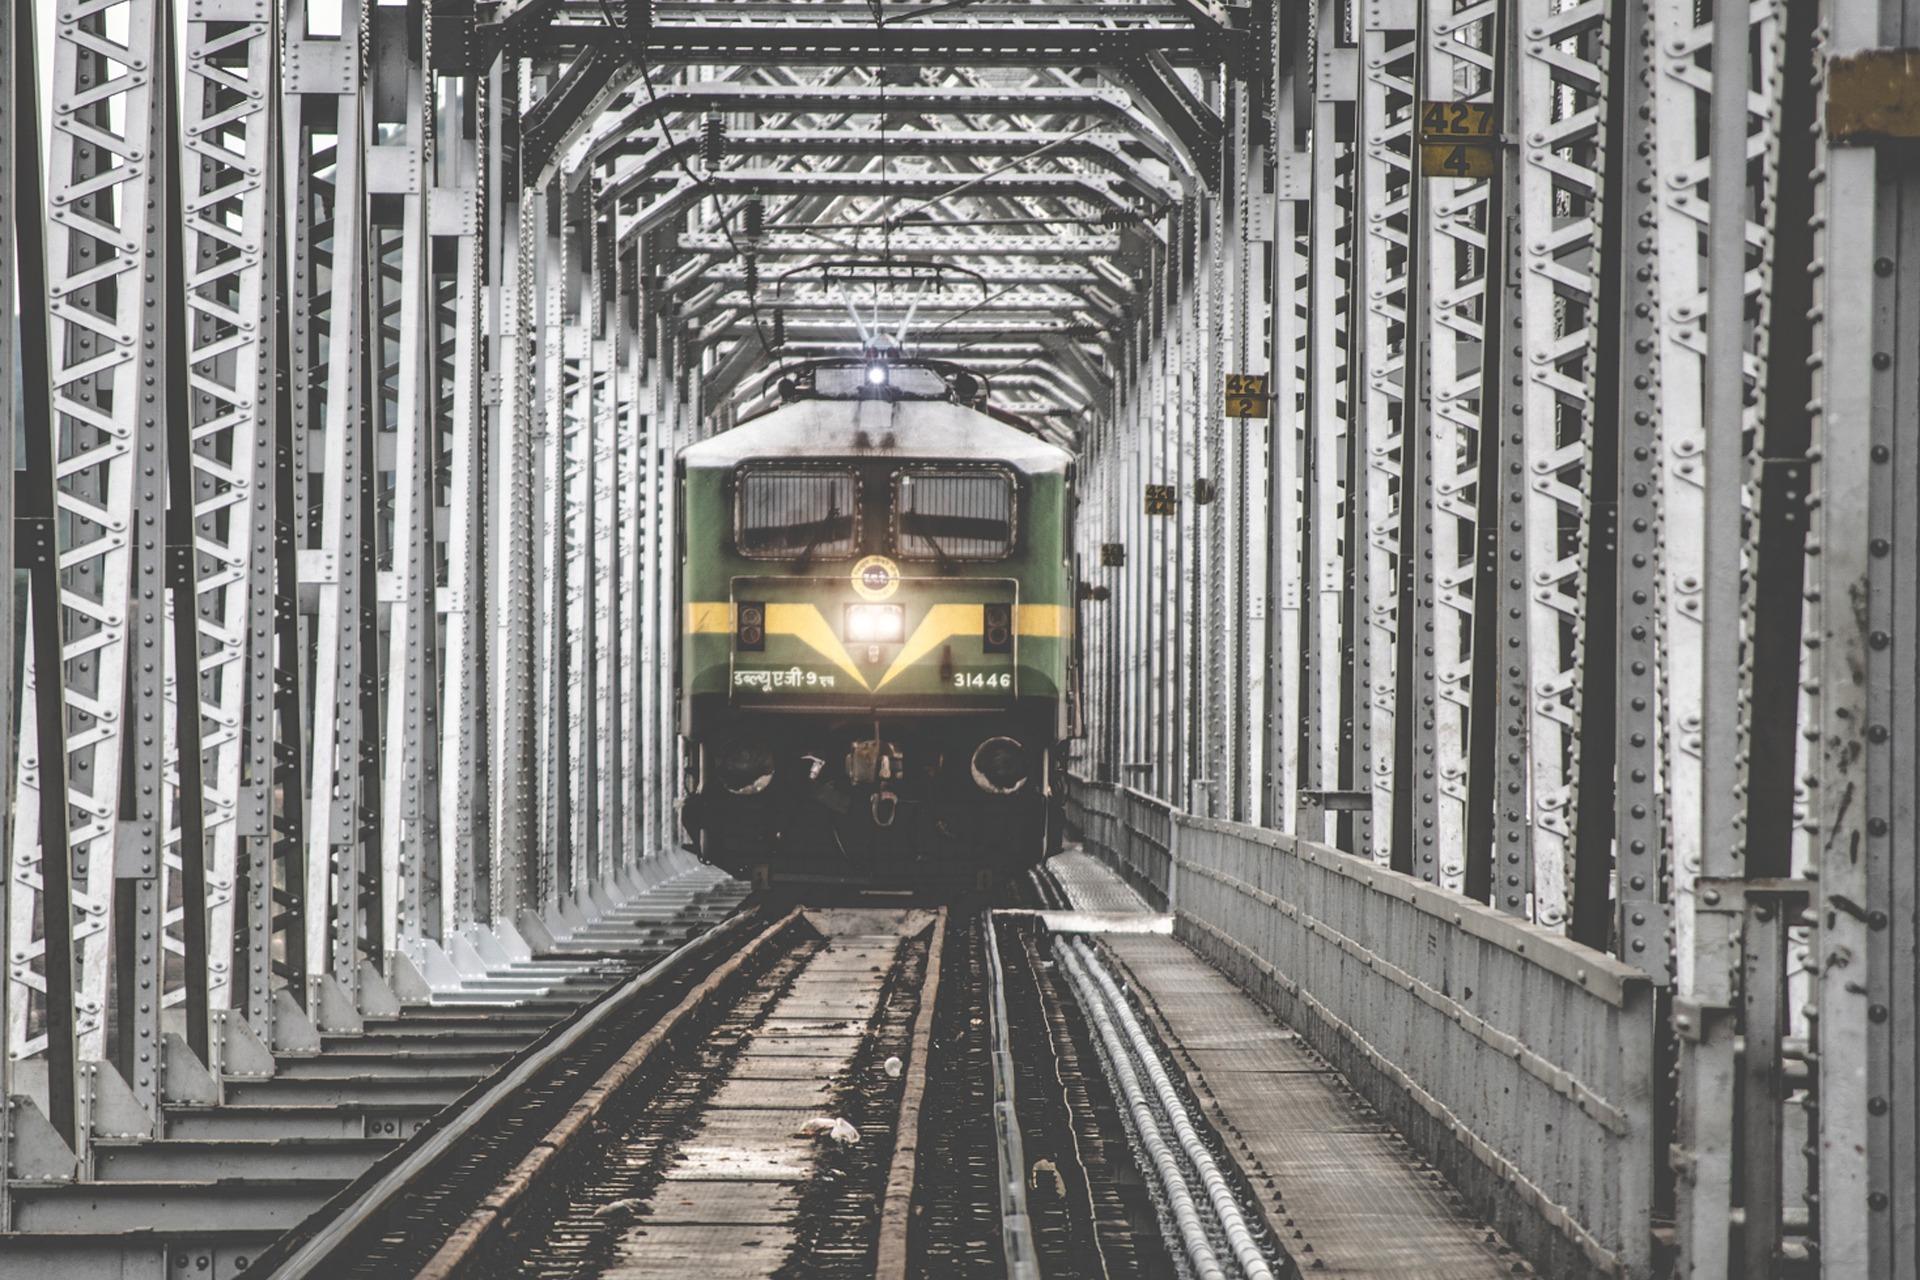 train, pont, chemin de fer, Inde, mouvement - Fonds d'écran HD - Professor-falken.com